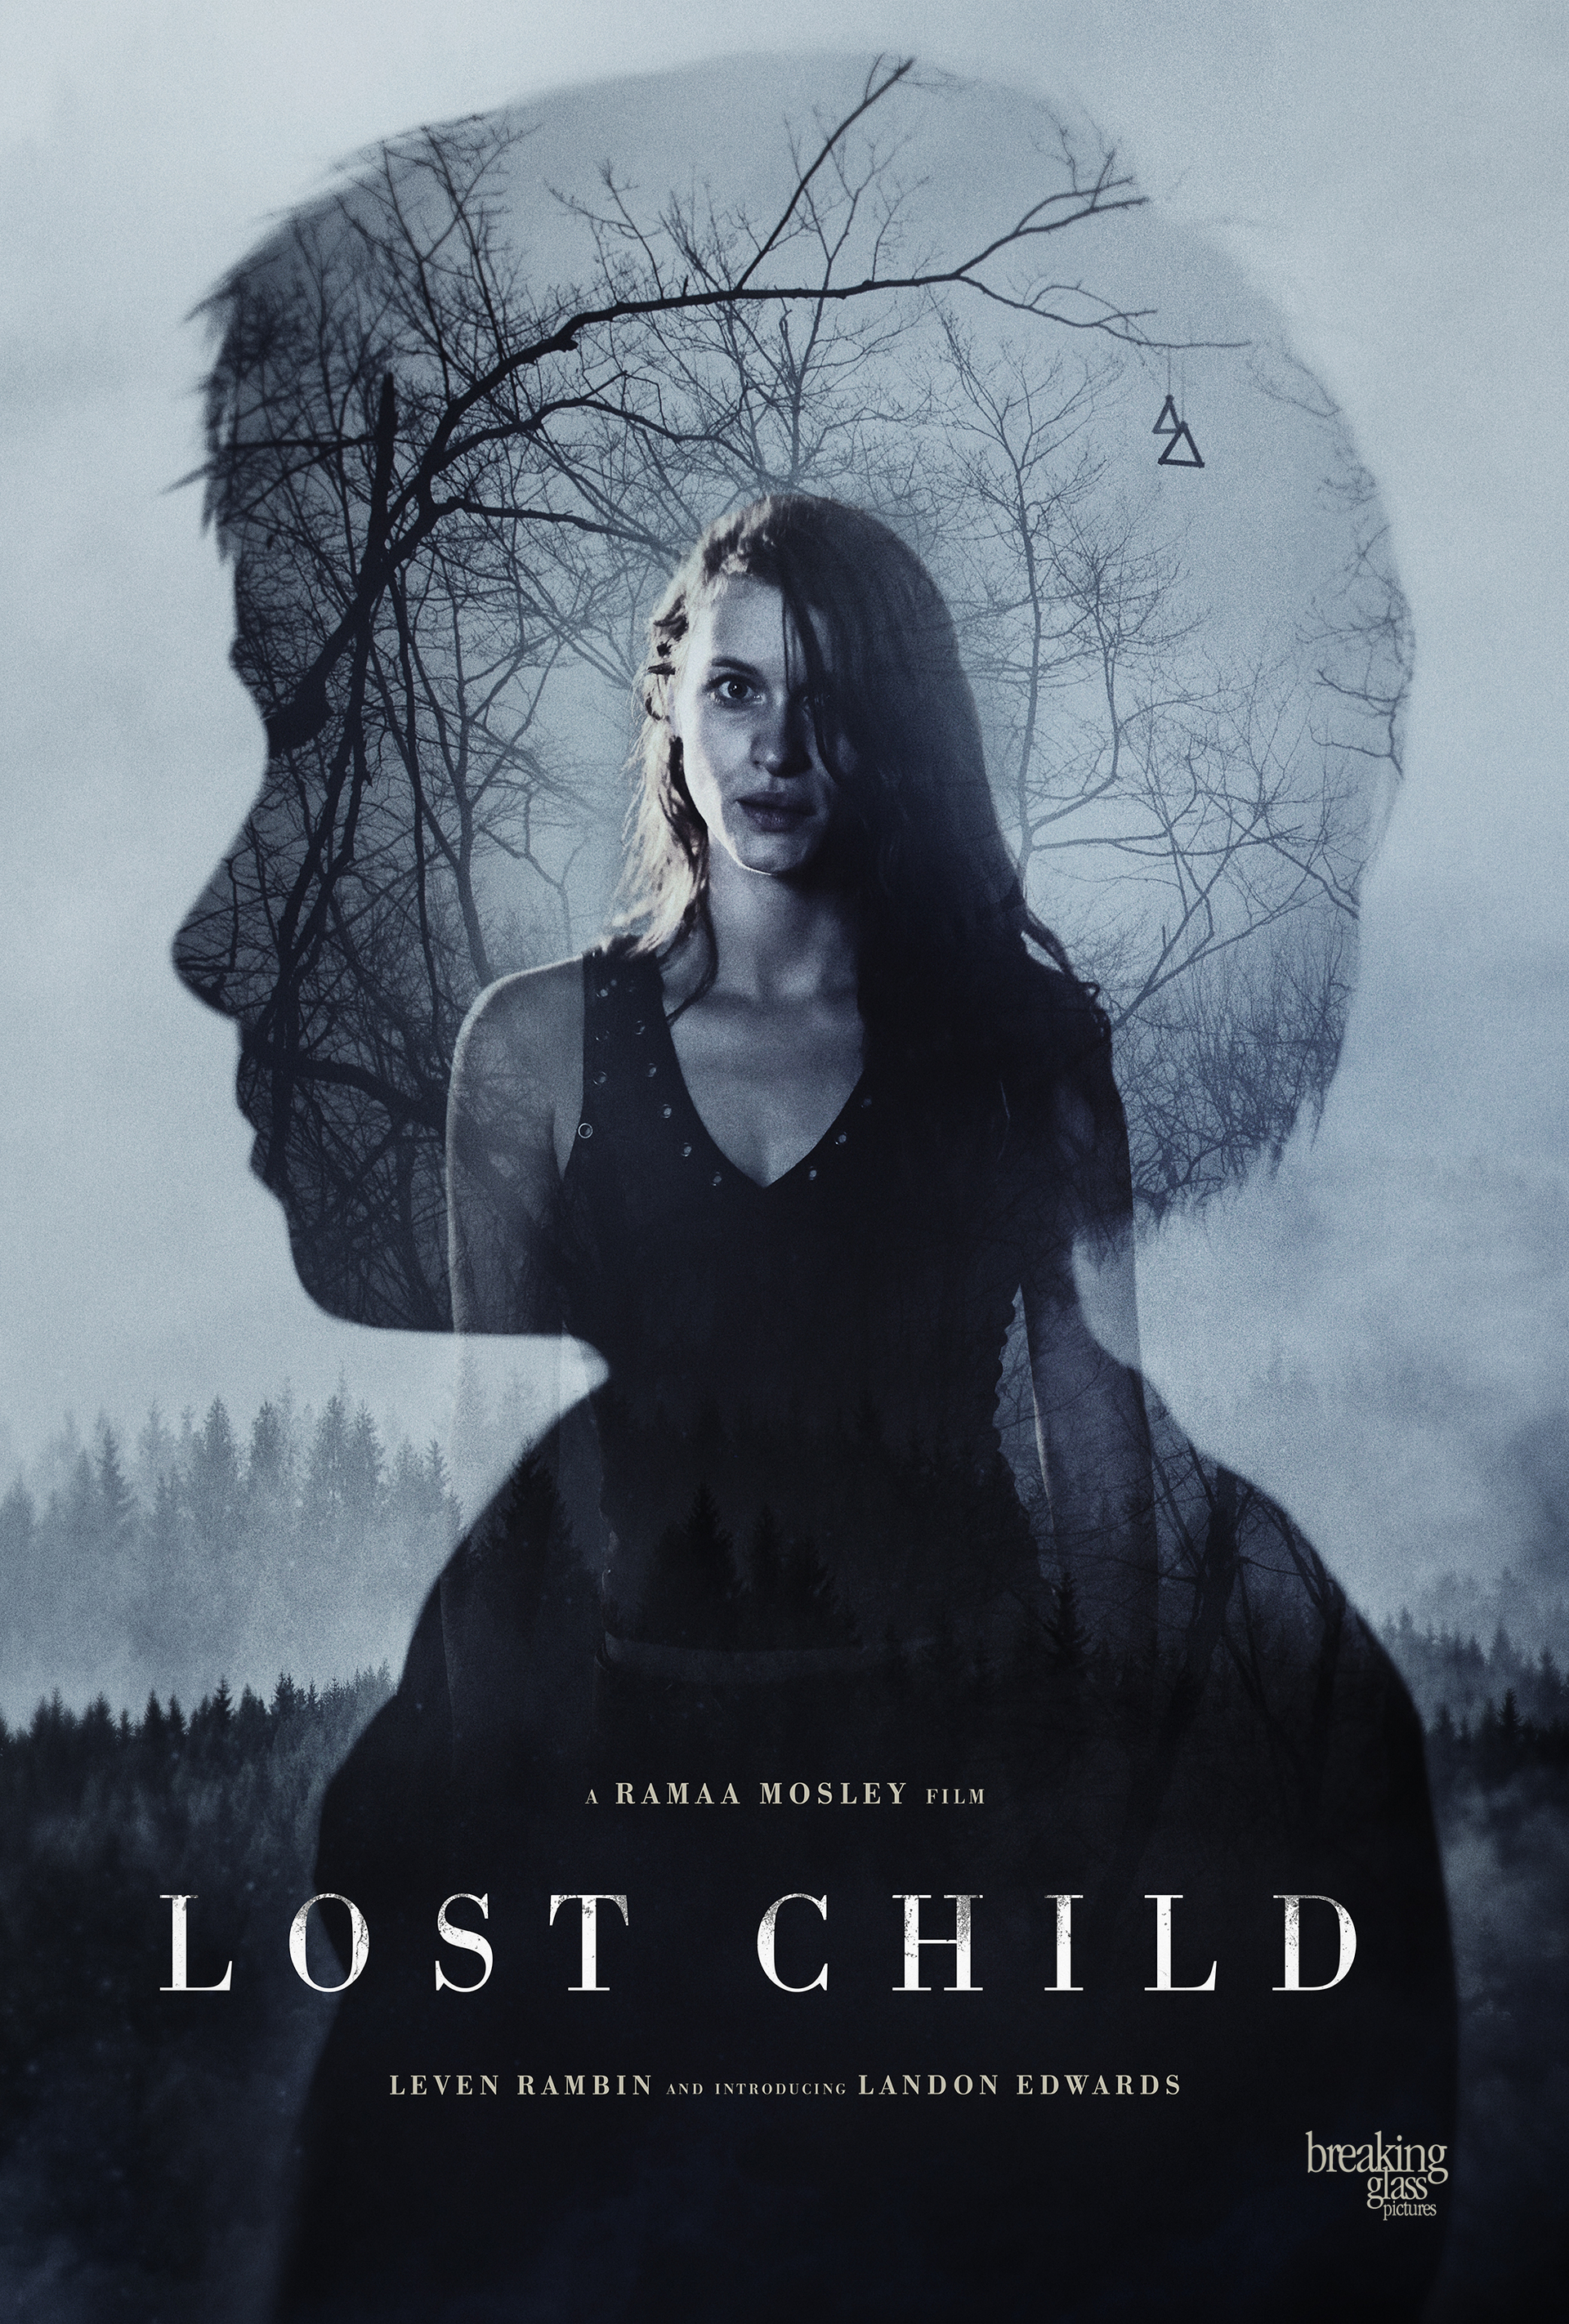 LostChild_KA_Logo.jpg?1531943074